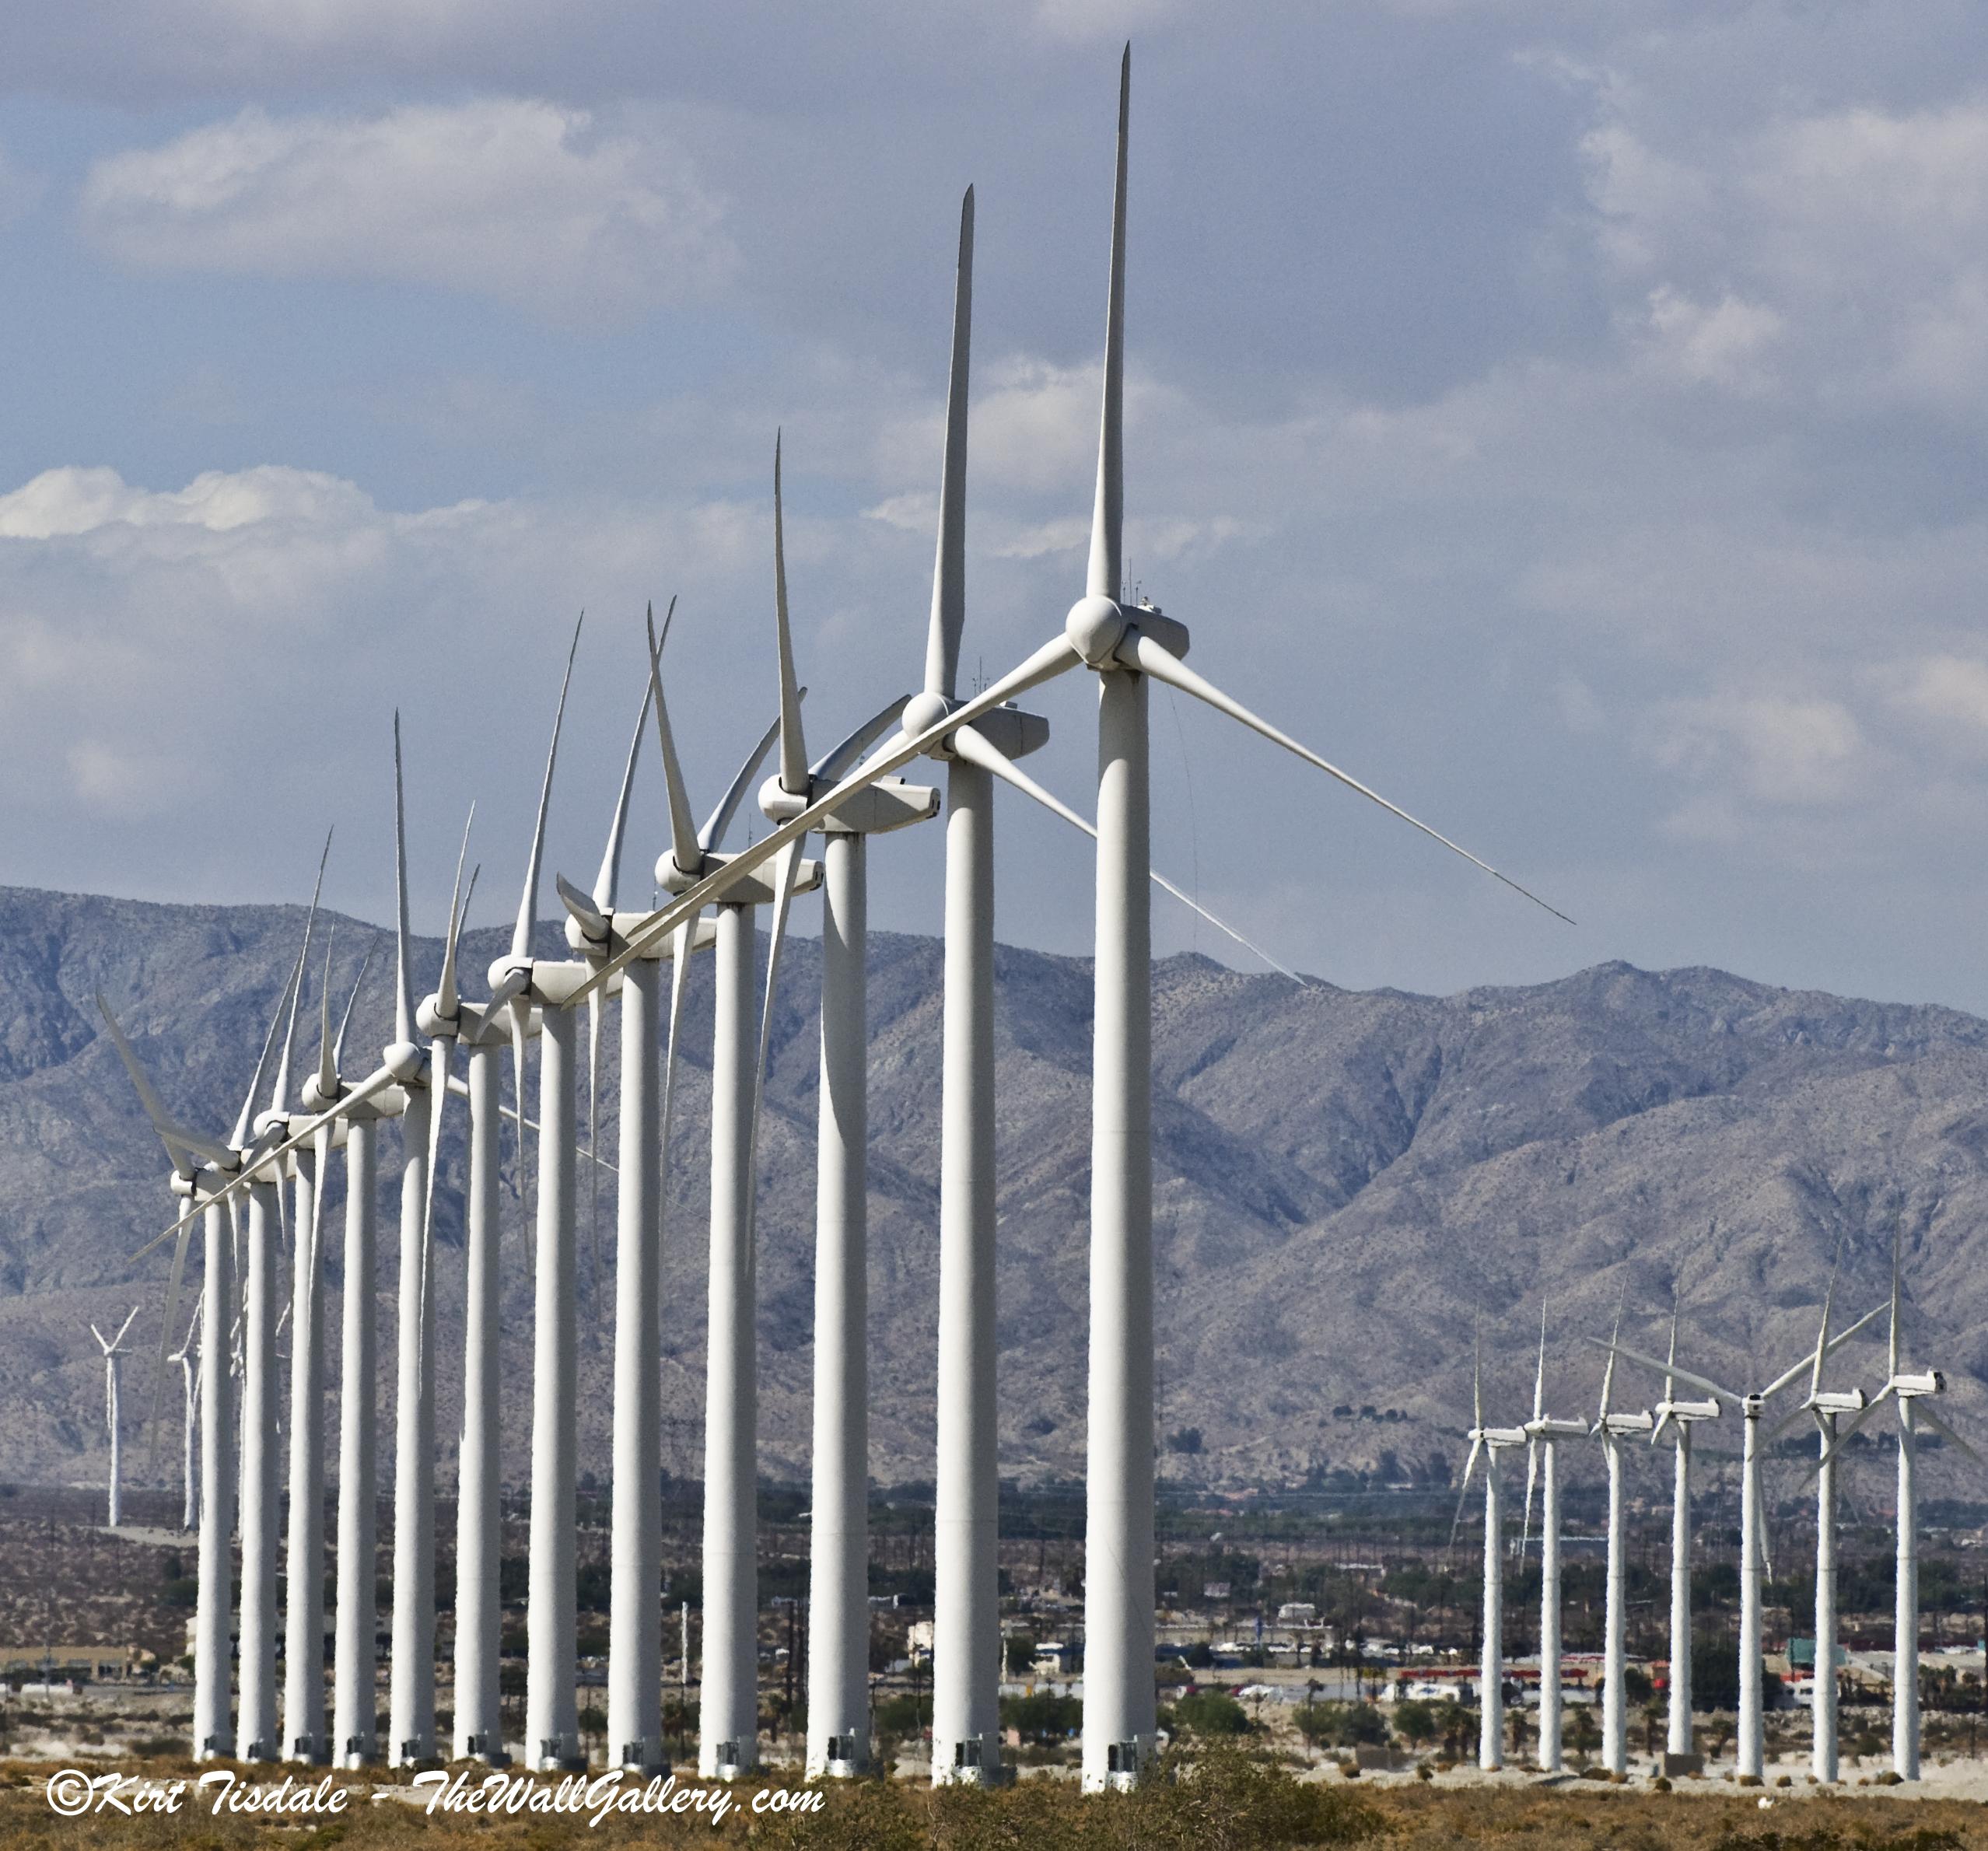 Wind Turbine 2: Cropped